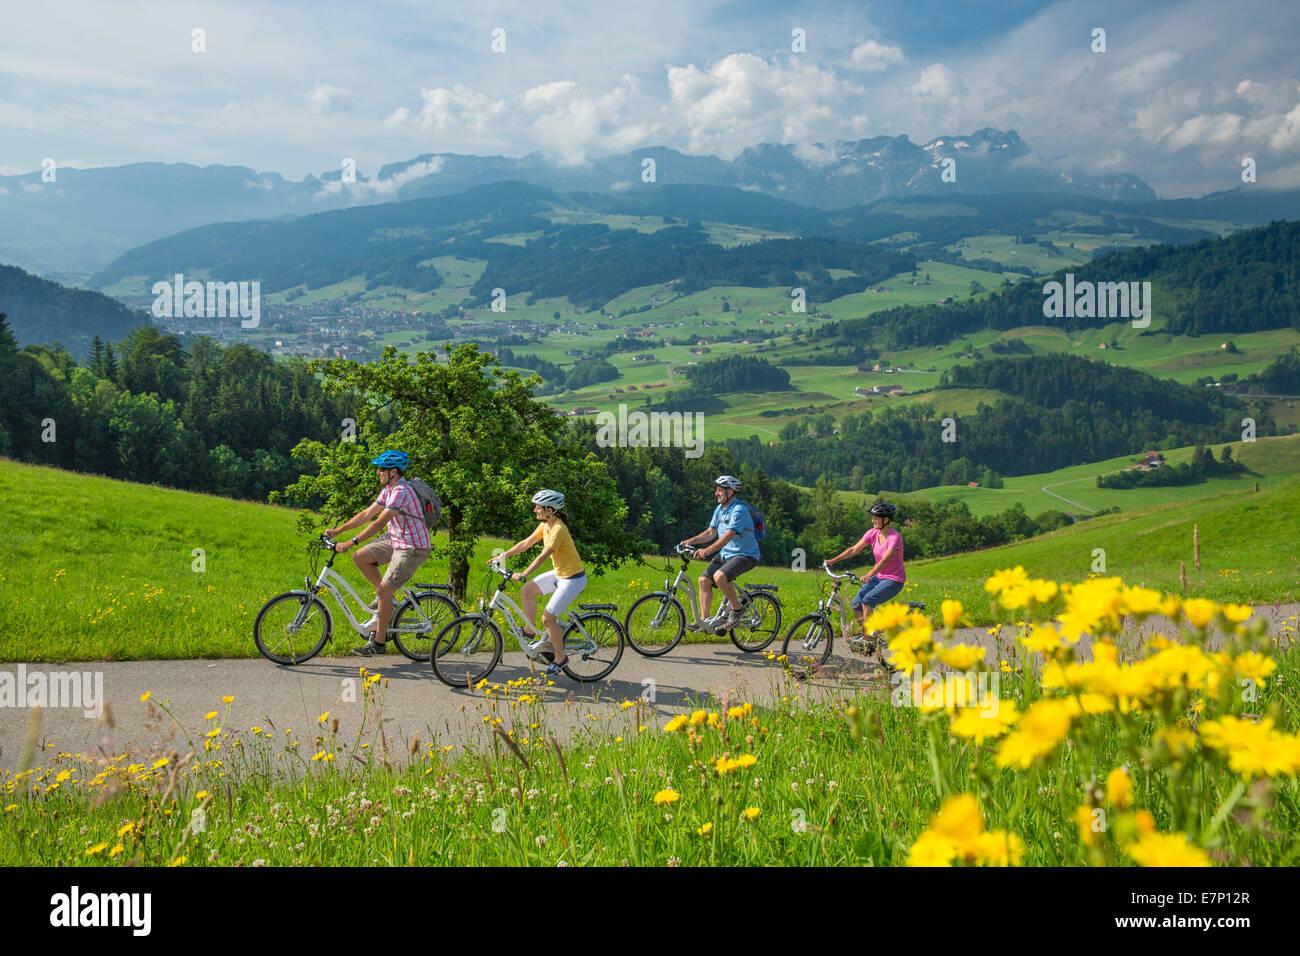 Herz-Route, Biker, Herzroute, Fahrrad, Fahrräder, Fahrrad, Fahrrad fahren, Kanton Appenzell, Innerroden, Flyer, Stockbild